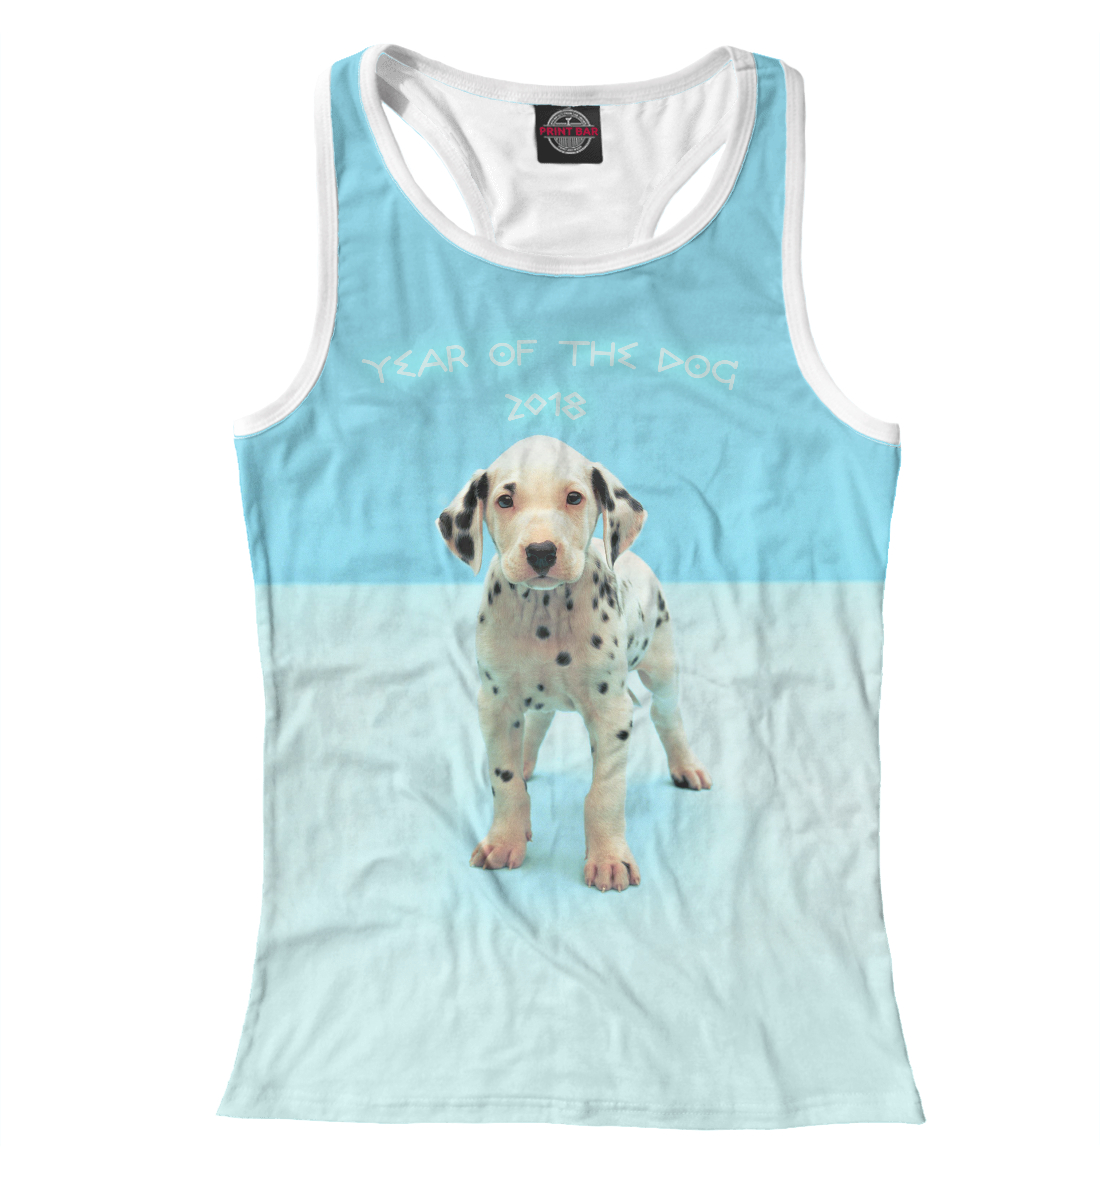 Купить 2018 Year of the dog, Printbar, Майки борцовки, DOG-808733-mayb-1